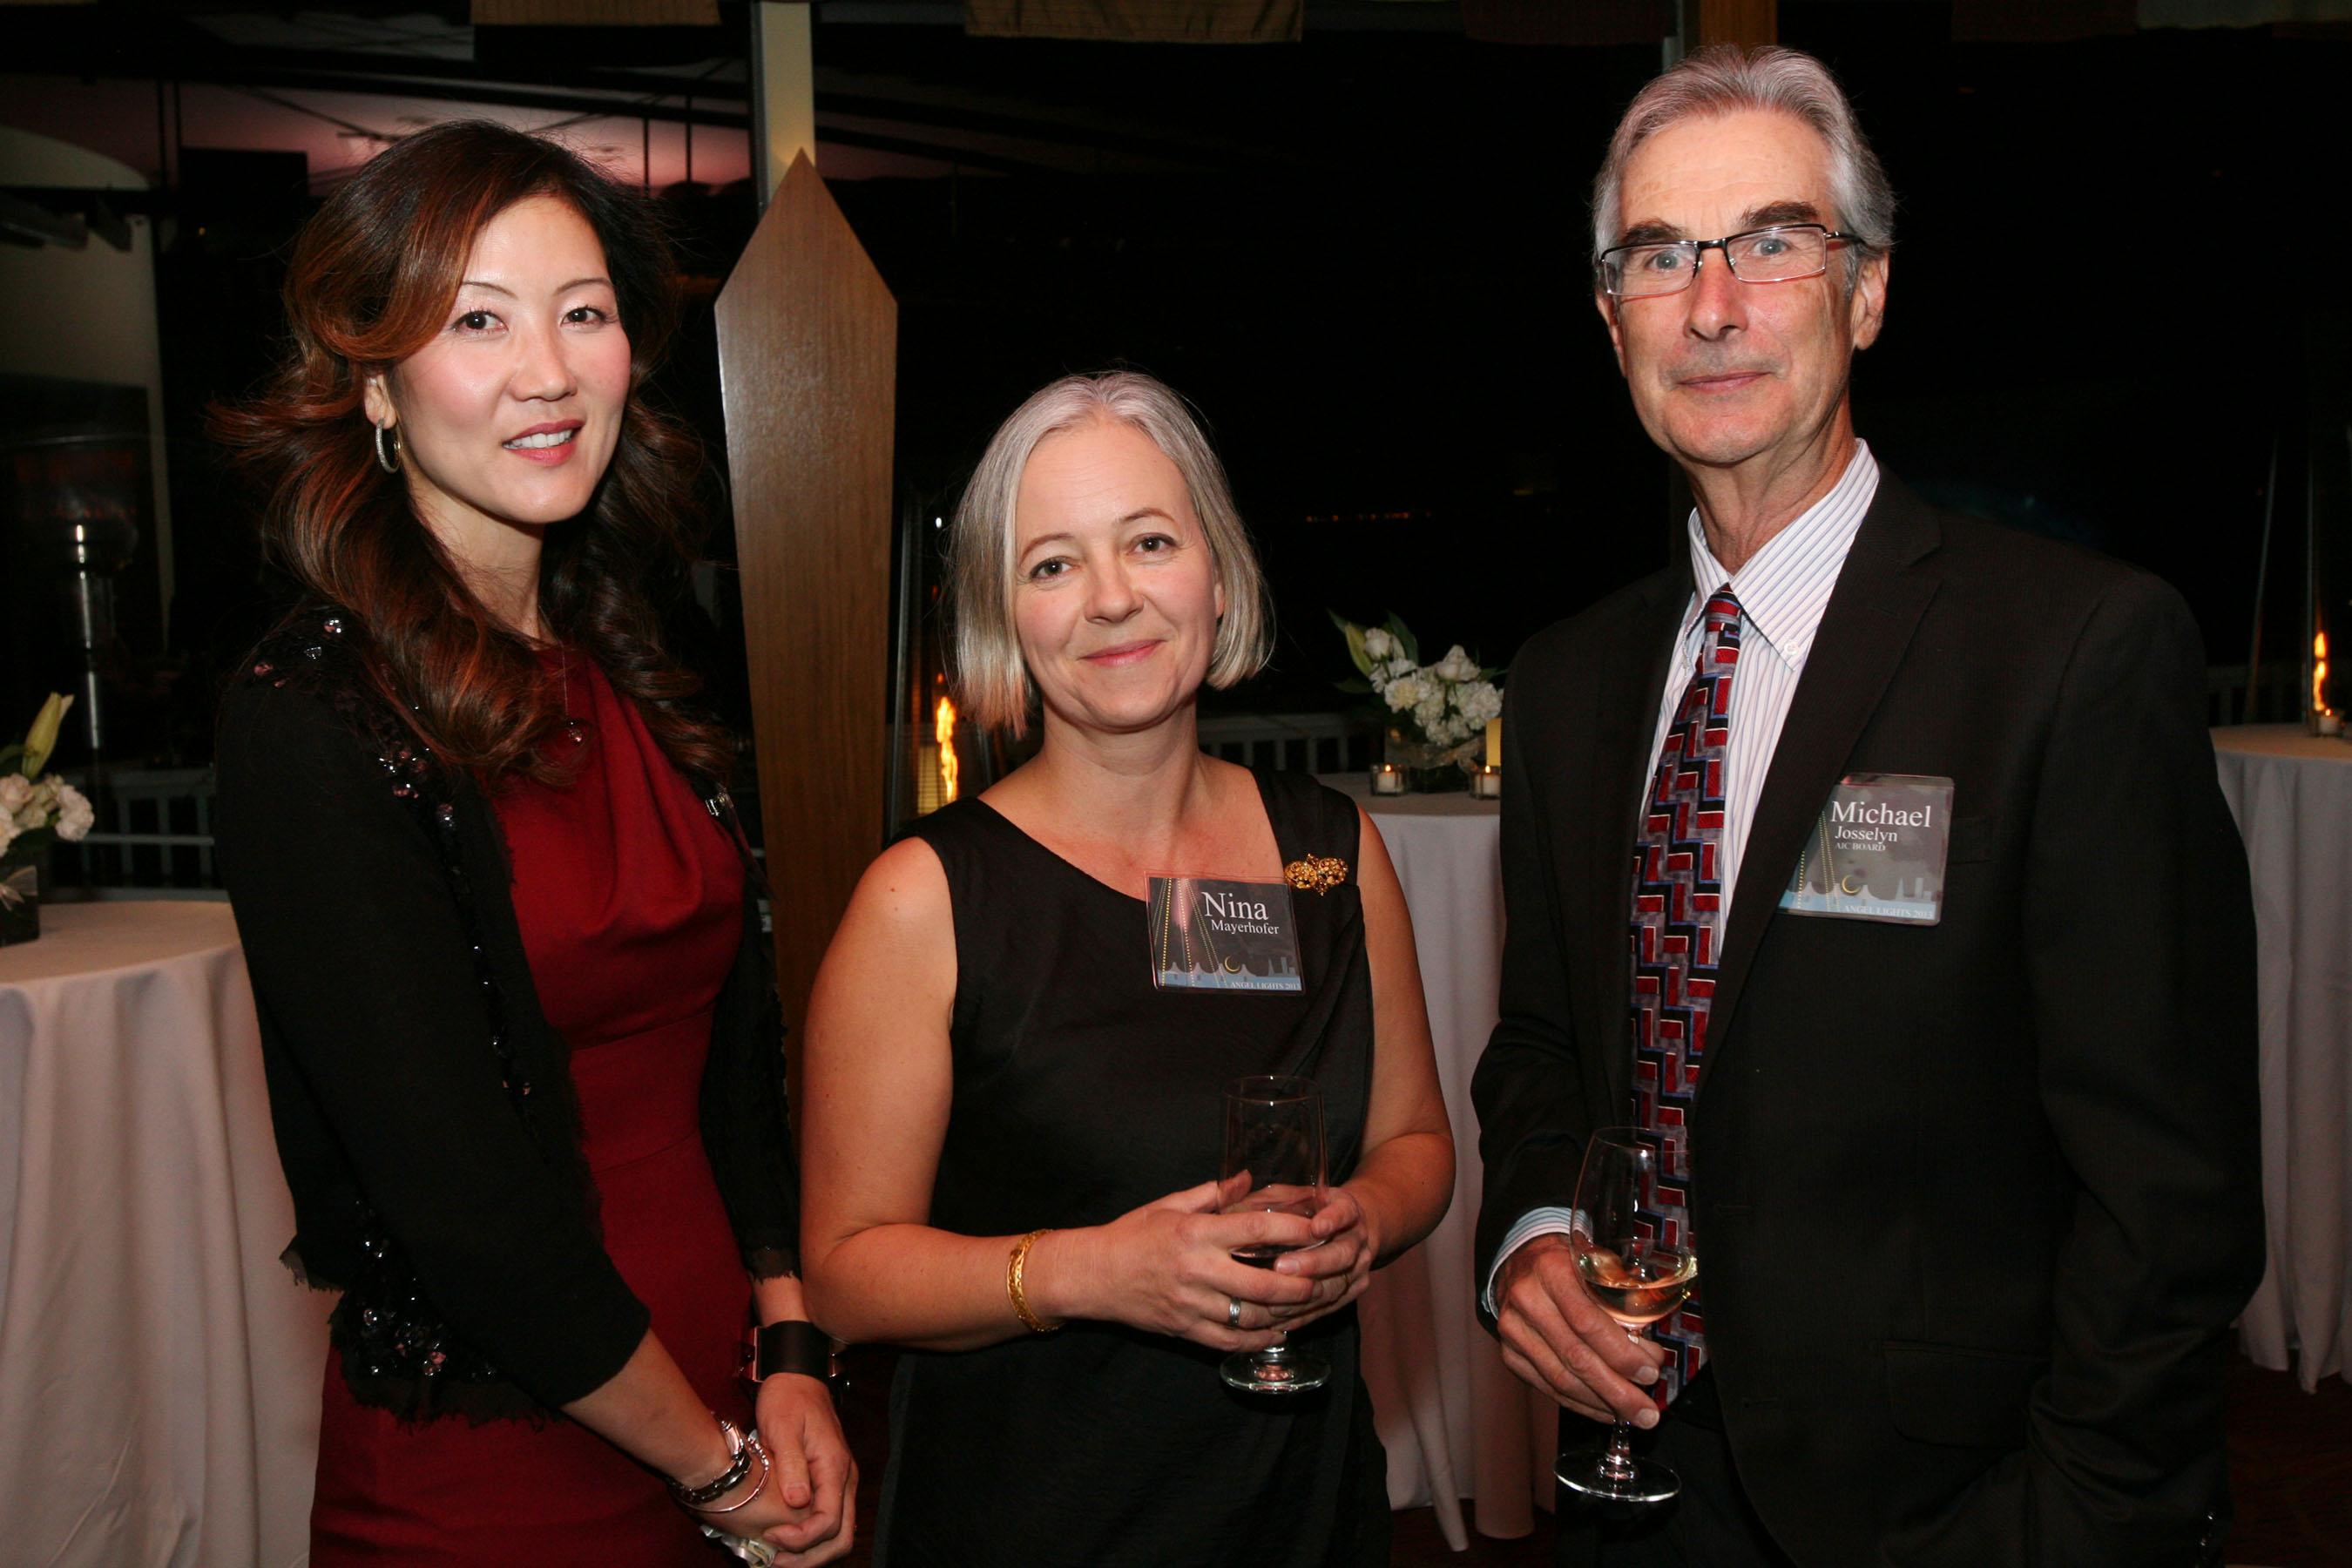 Grace Salk - AIC Board of Directors, Nina Mayerhofer Angel Lights Committee Member and Mike Jossellyn - AIC Board Treasurer